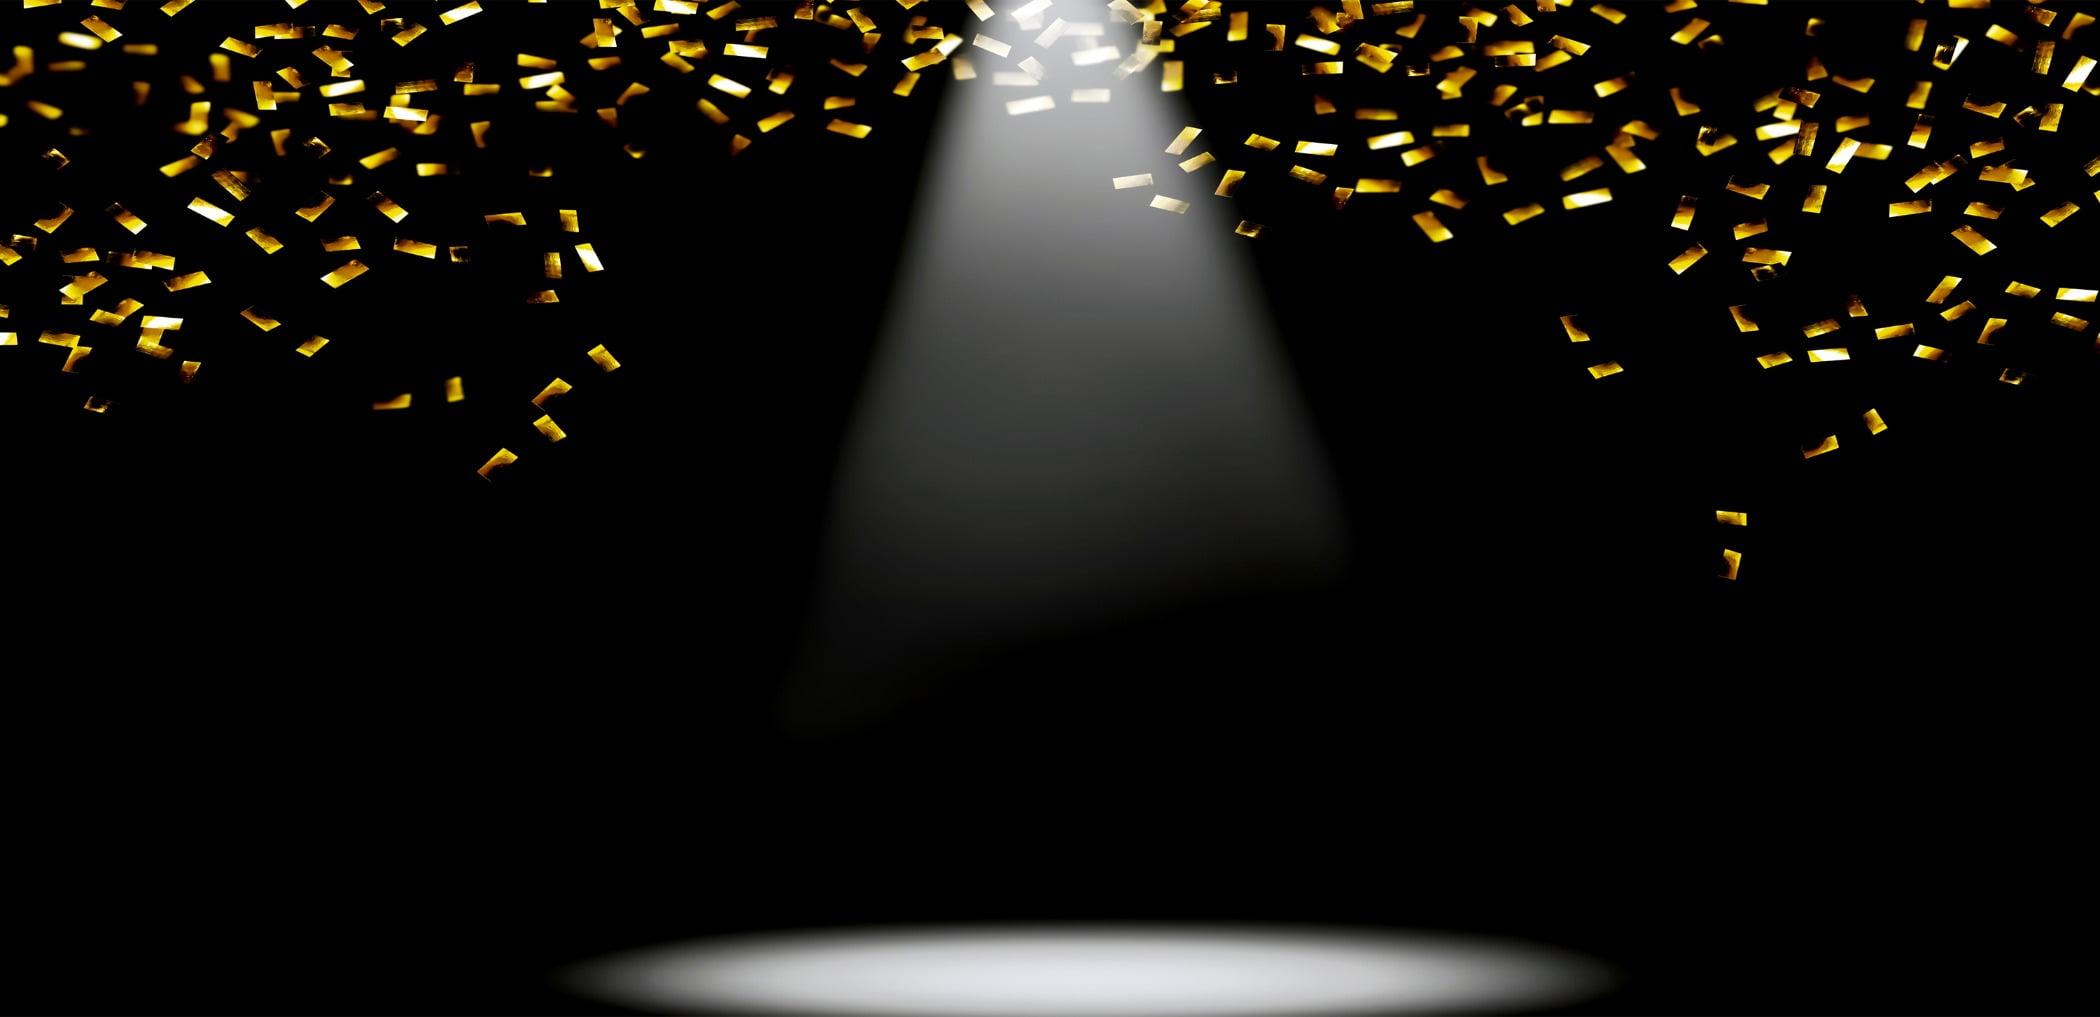 Festive shower of golden confetti